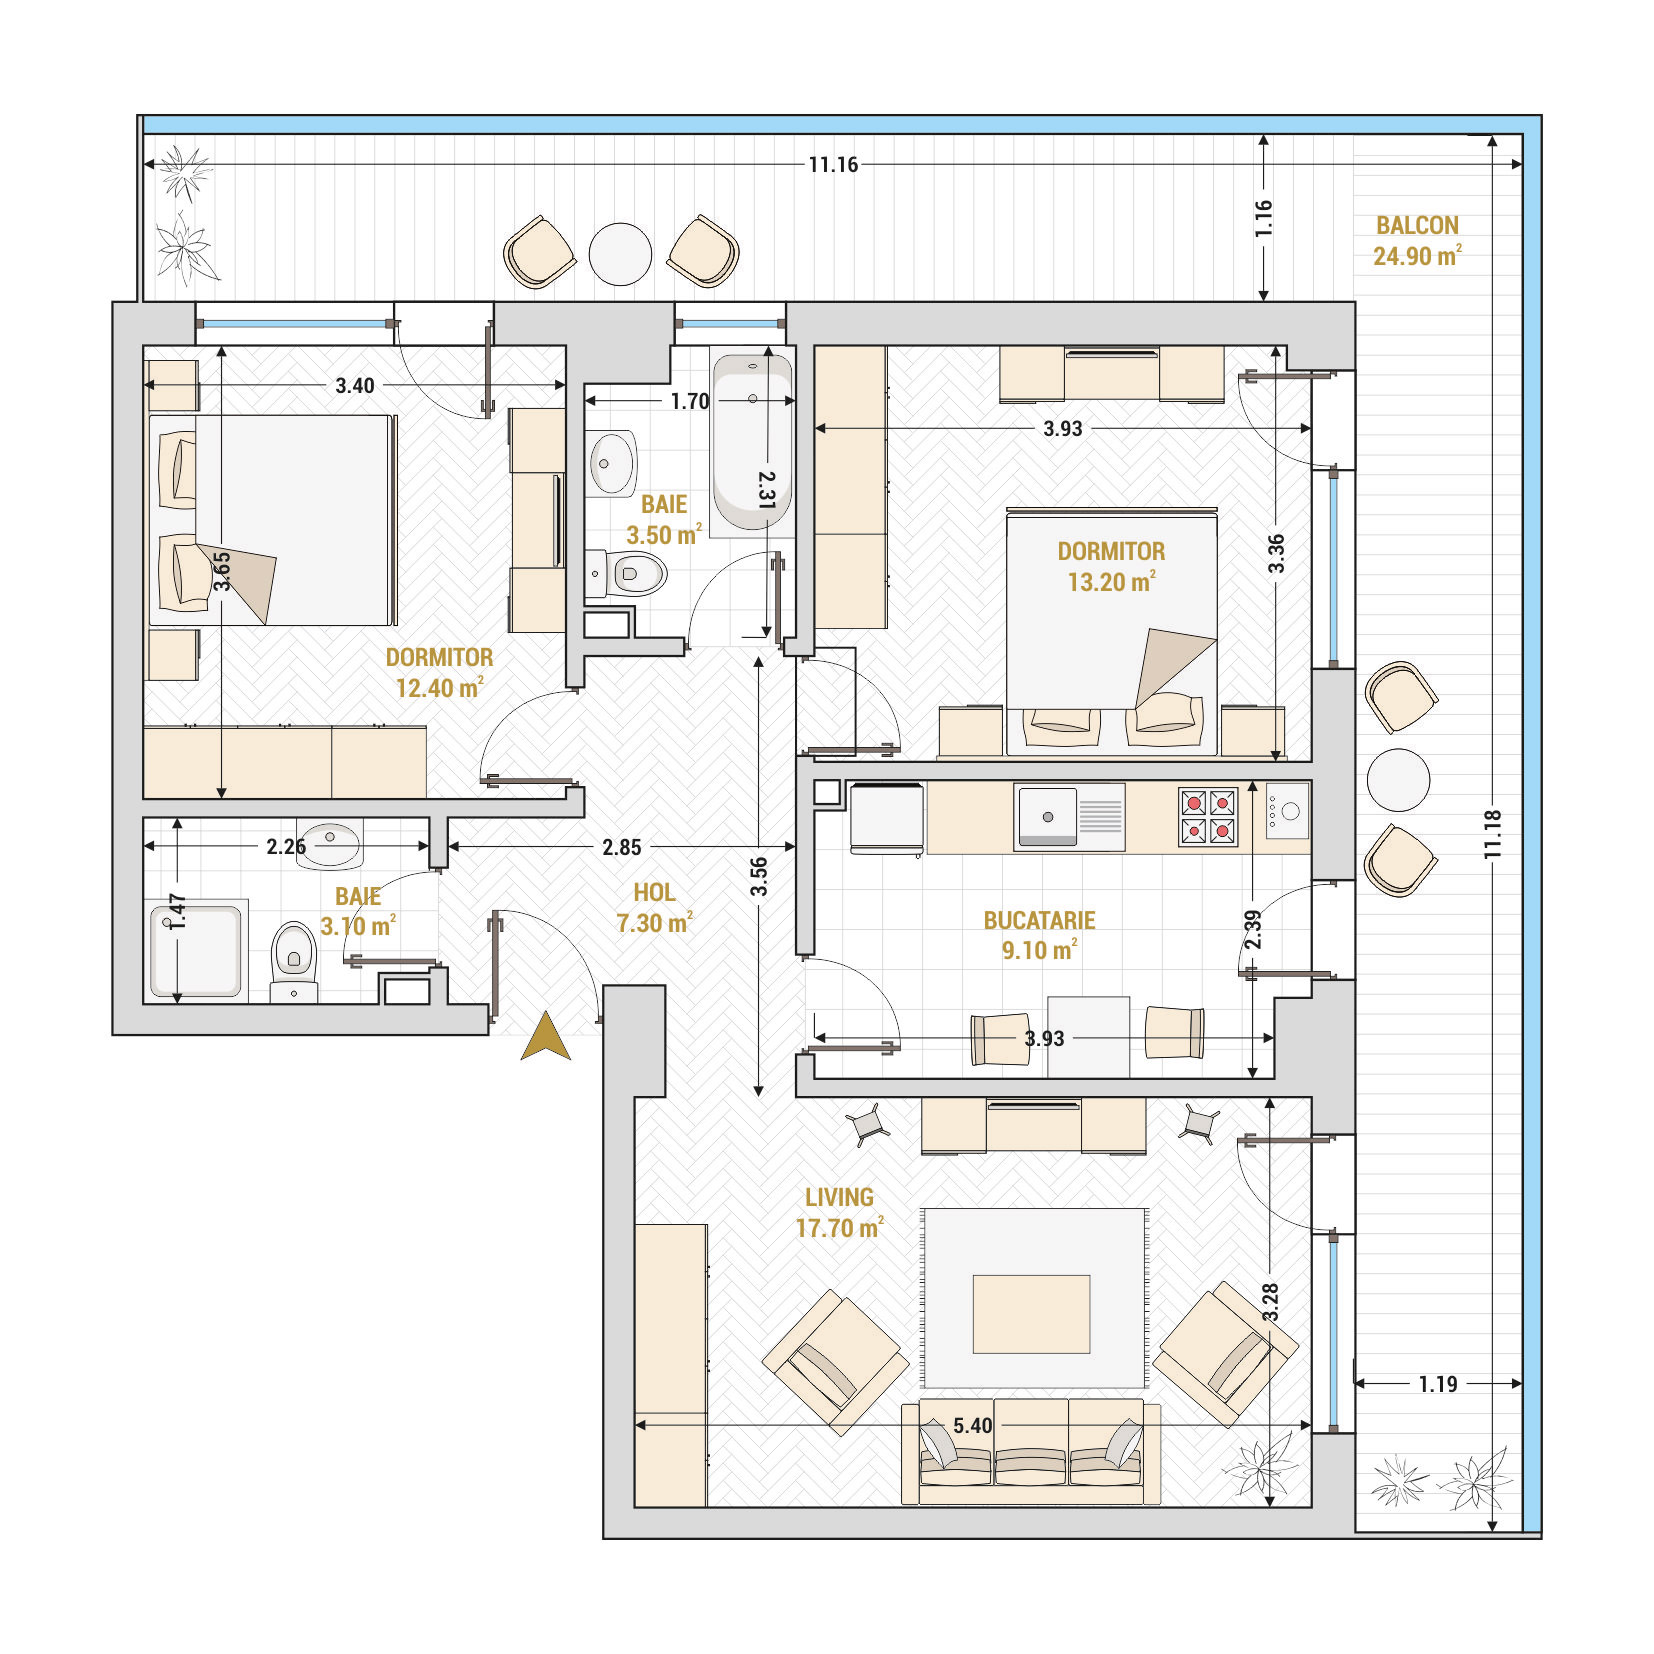 Apartamente cu 3 camere Bucuresti - Catedral Residence - Marriott, Piata Unirii, 13 Septembrie, Izvor - Suprafata utila totala - 91.20 metri patrati